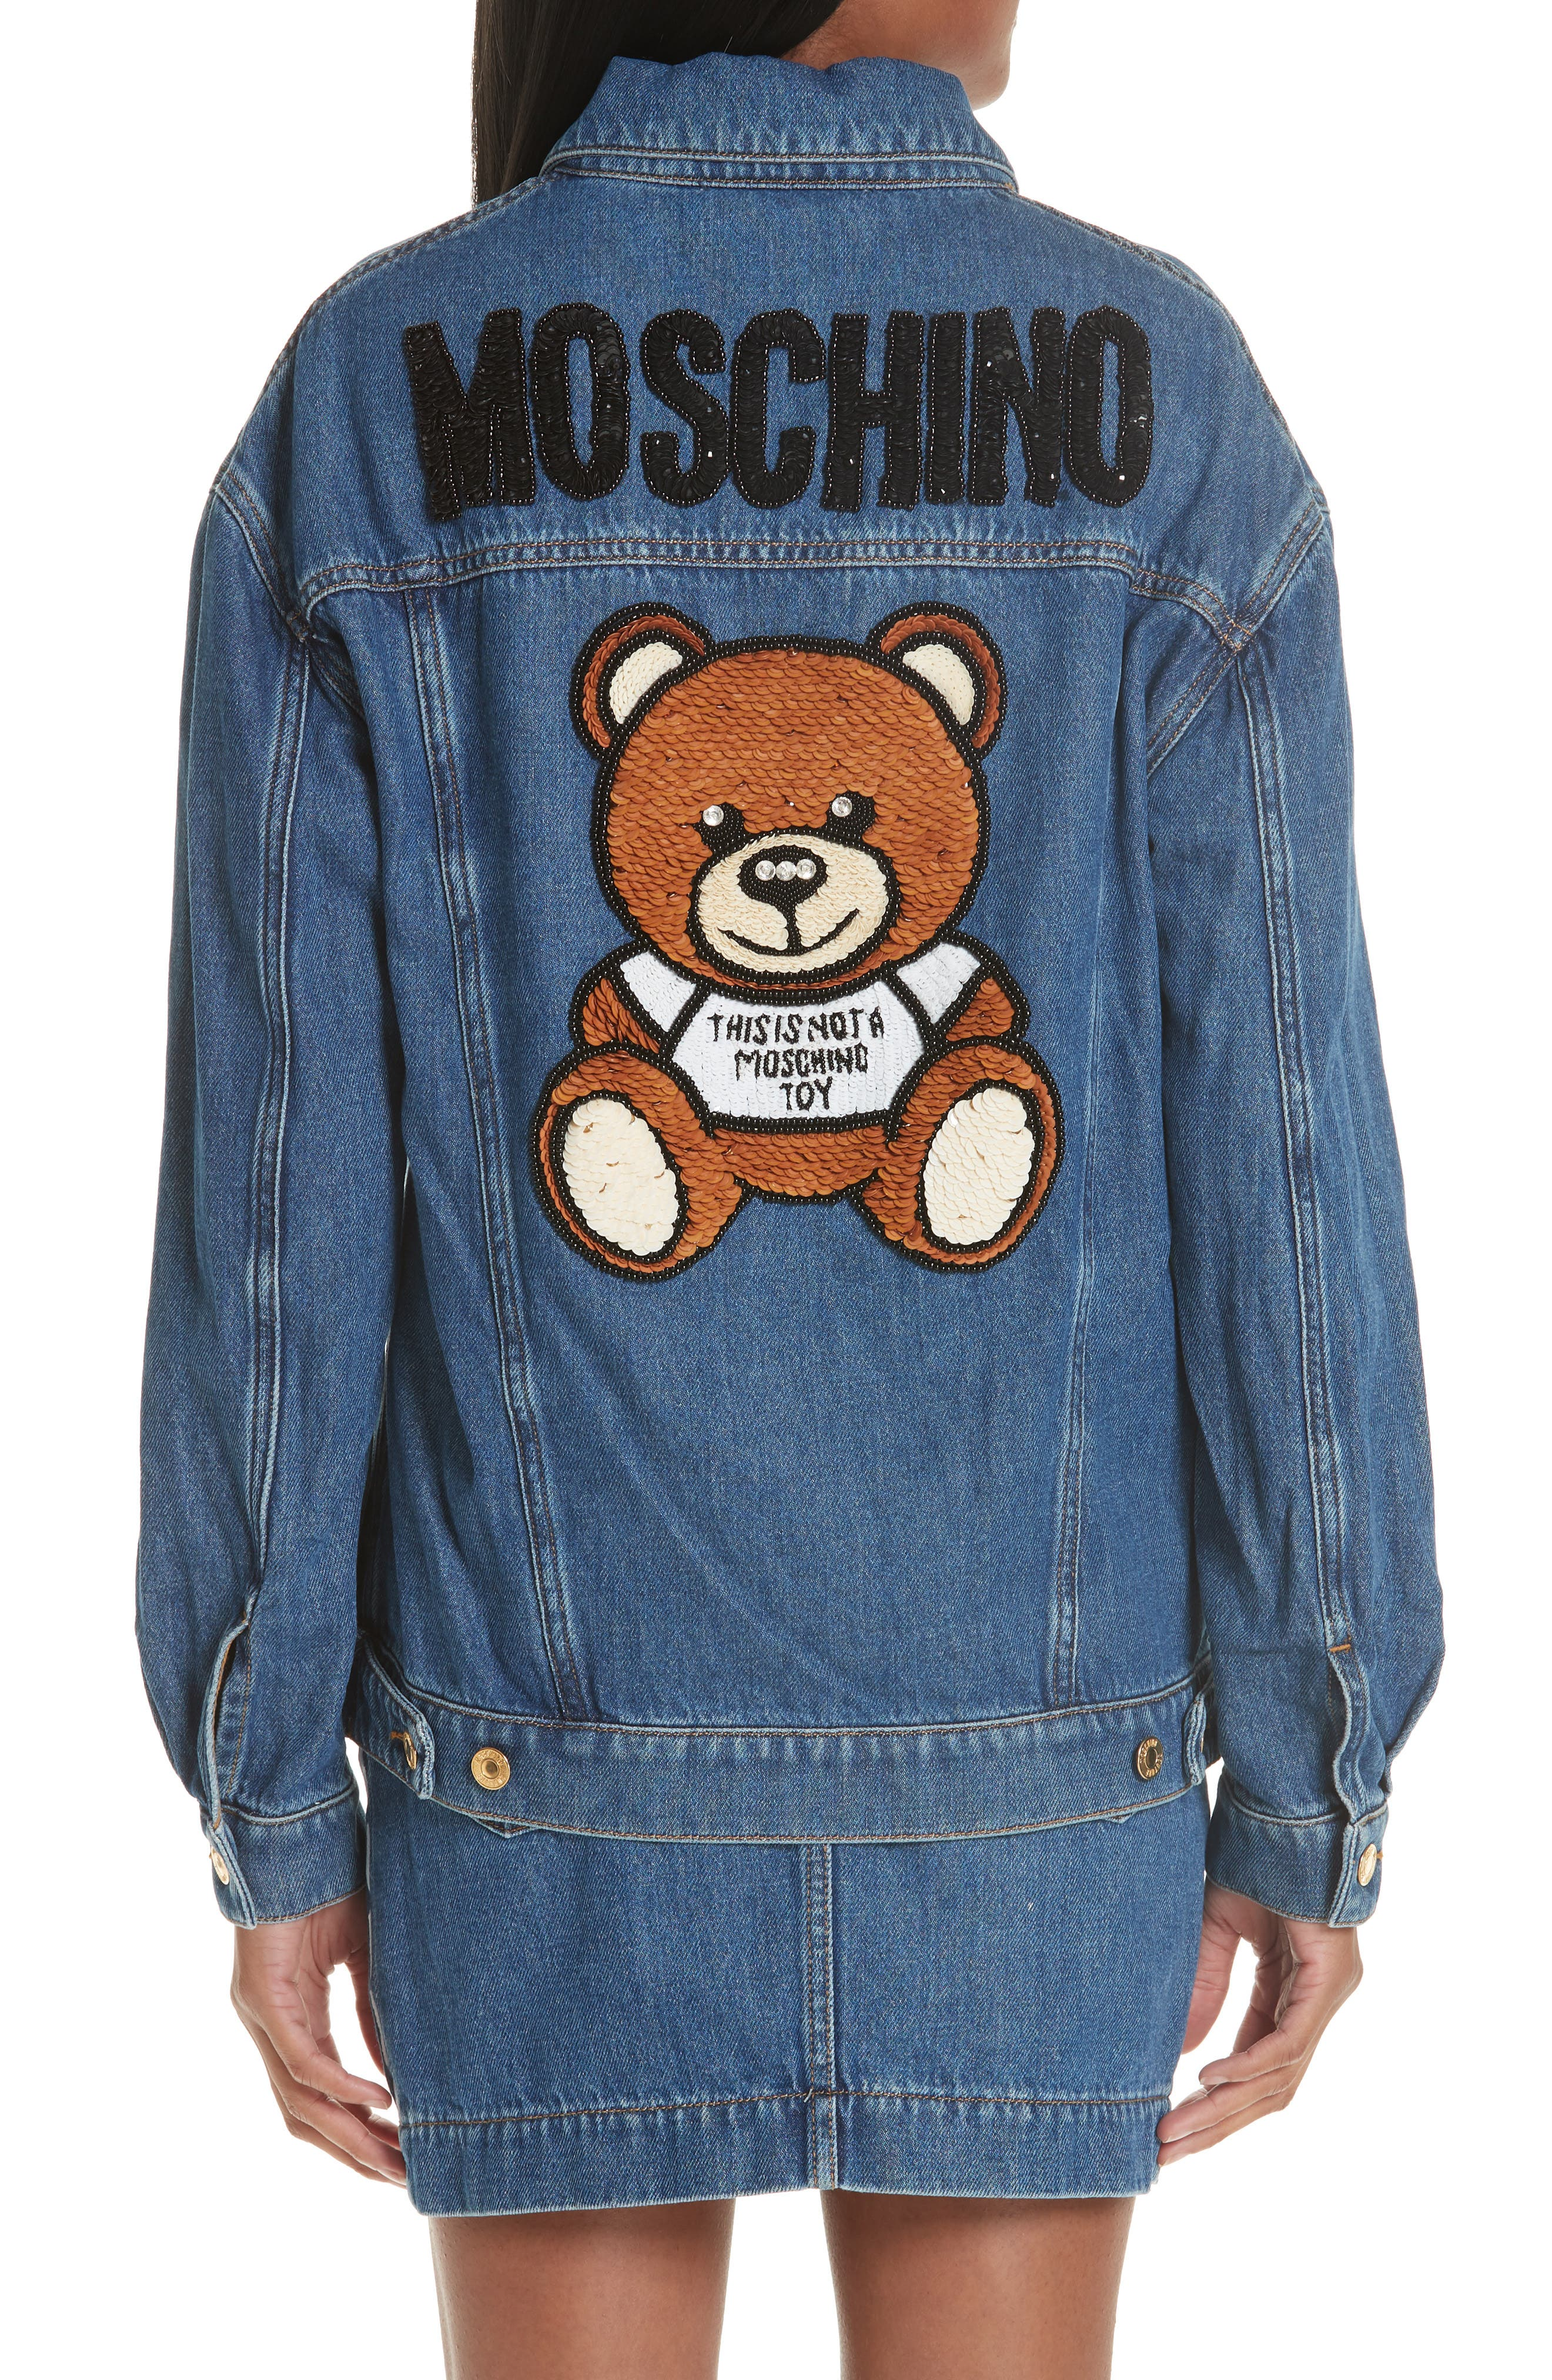 MOSCHINO, Sequin Teddy Denim Jacket, Alternate thumbnail 2, color, DENIM